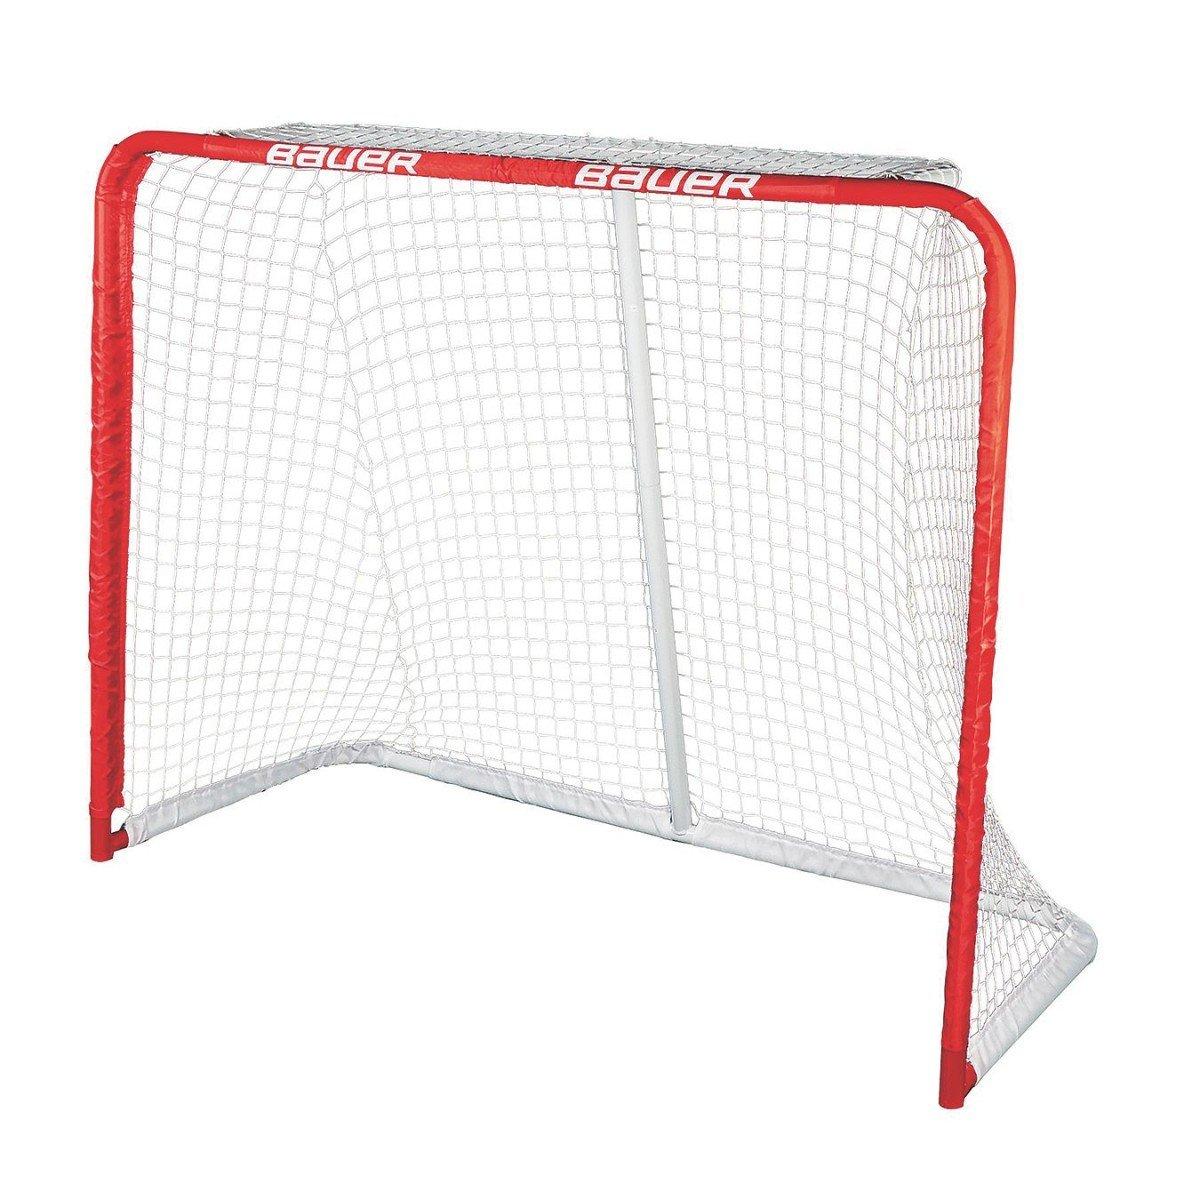 Bauer Street Hockey Deluxe Recreational Steel Goal, 54 x 44-Inch Bauer Deluxe REC Steel Goal Red Bauer Performance Sports 1046698